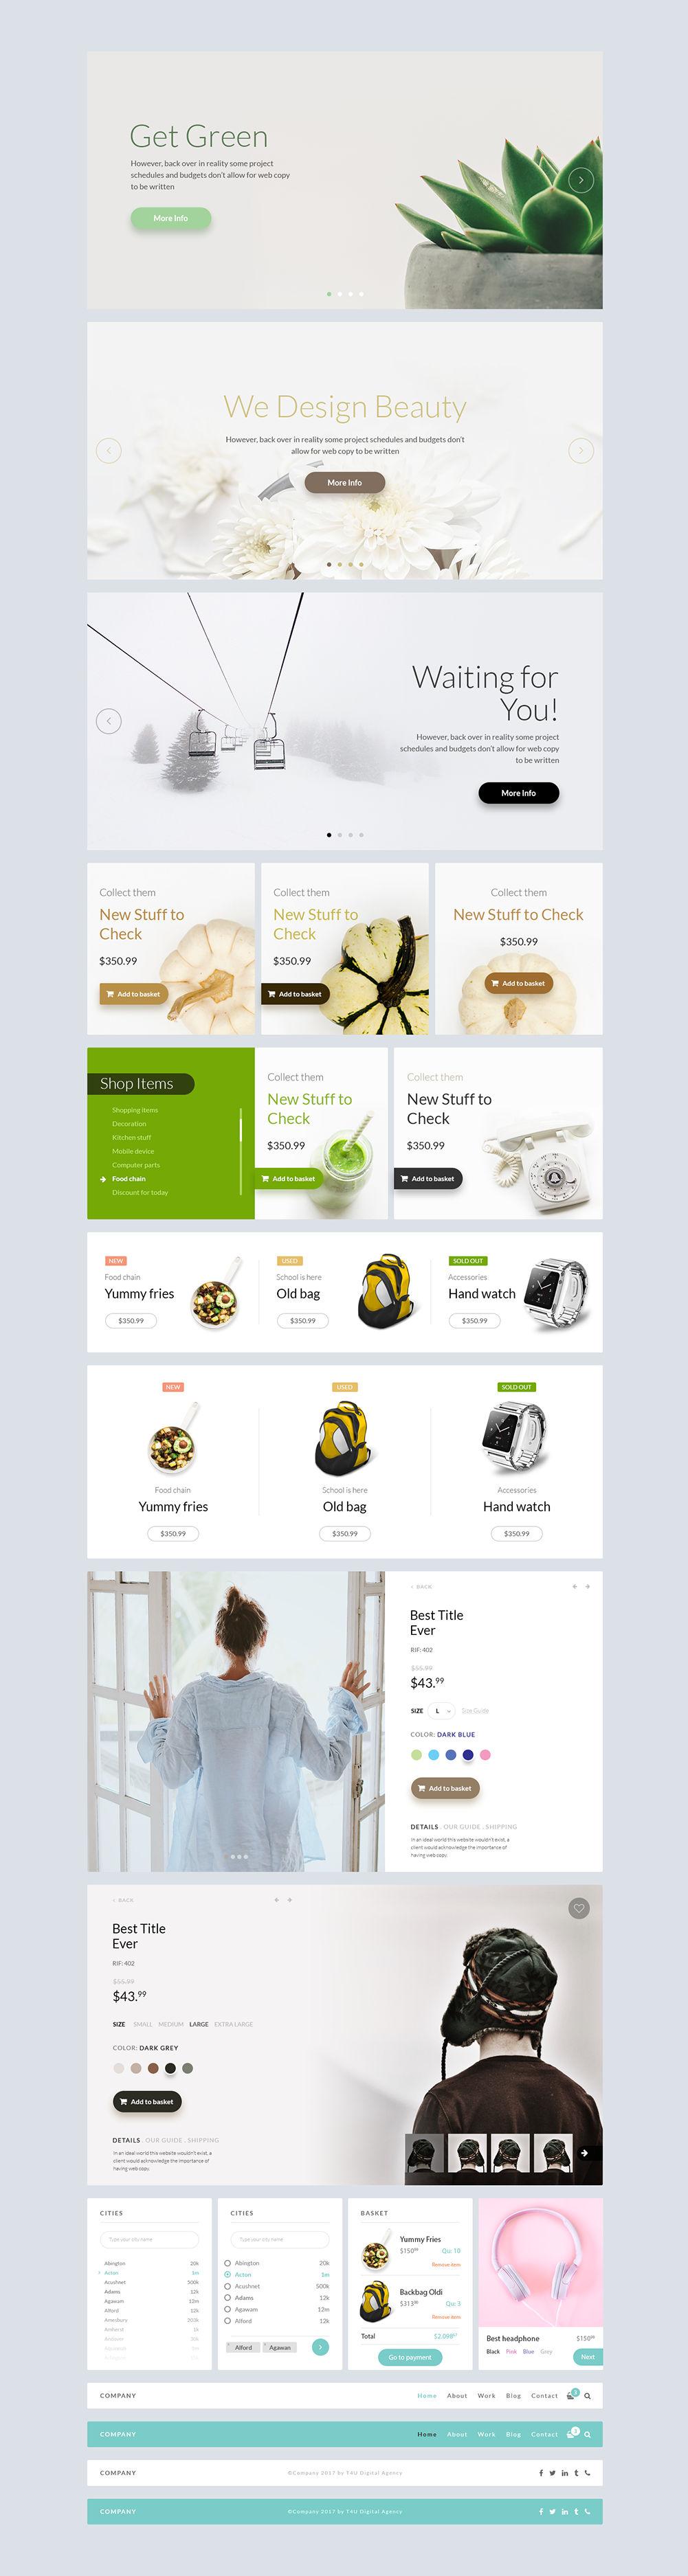 Free PSD Web UI Kit